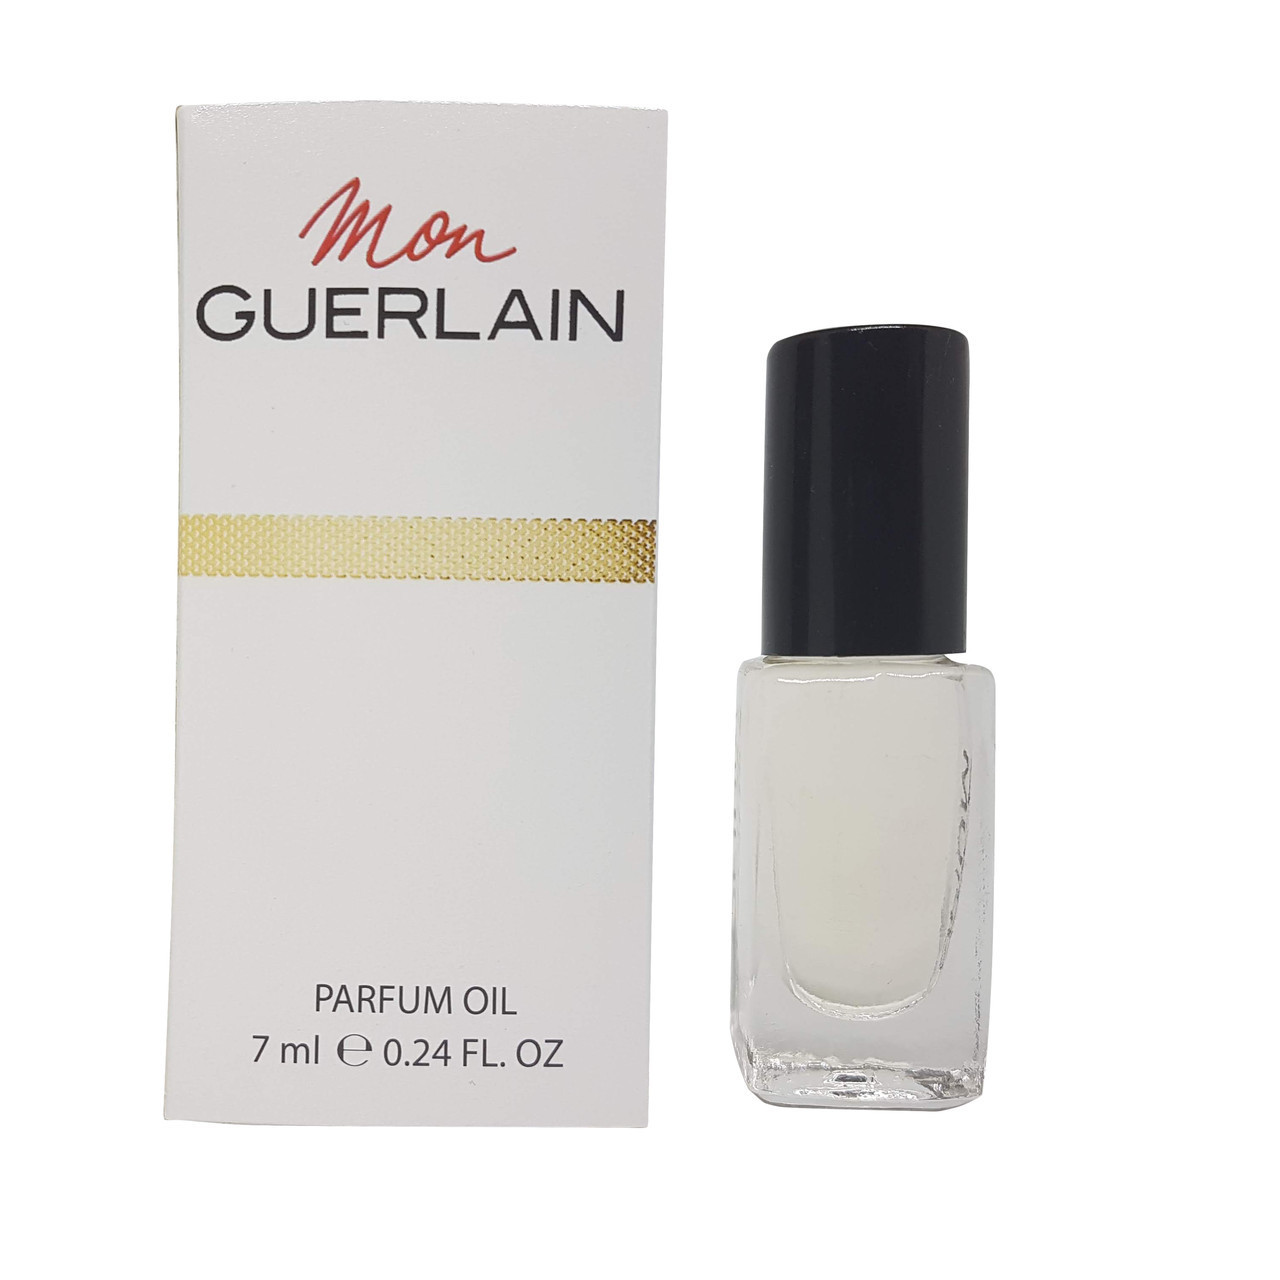 Guerlain Mon Guerlain - Parfum oil 7ml